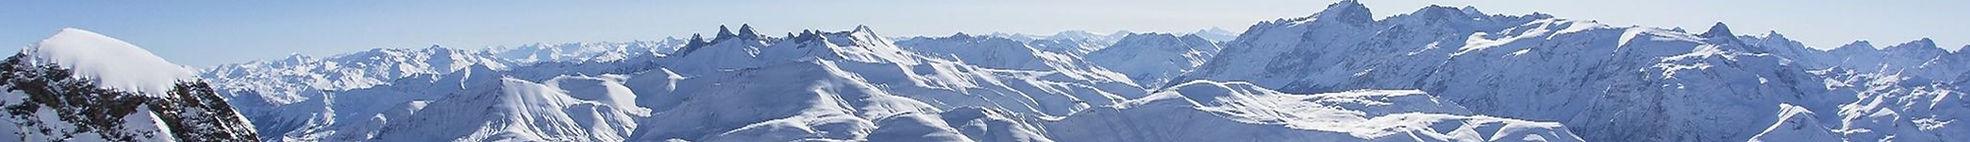 bandeau montagne2.JPG